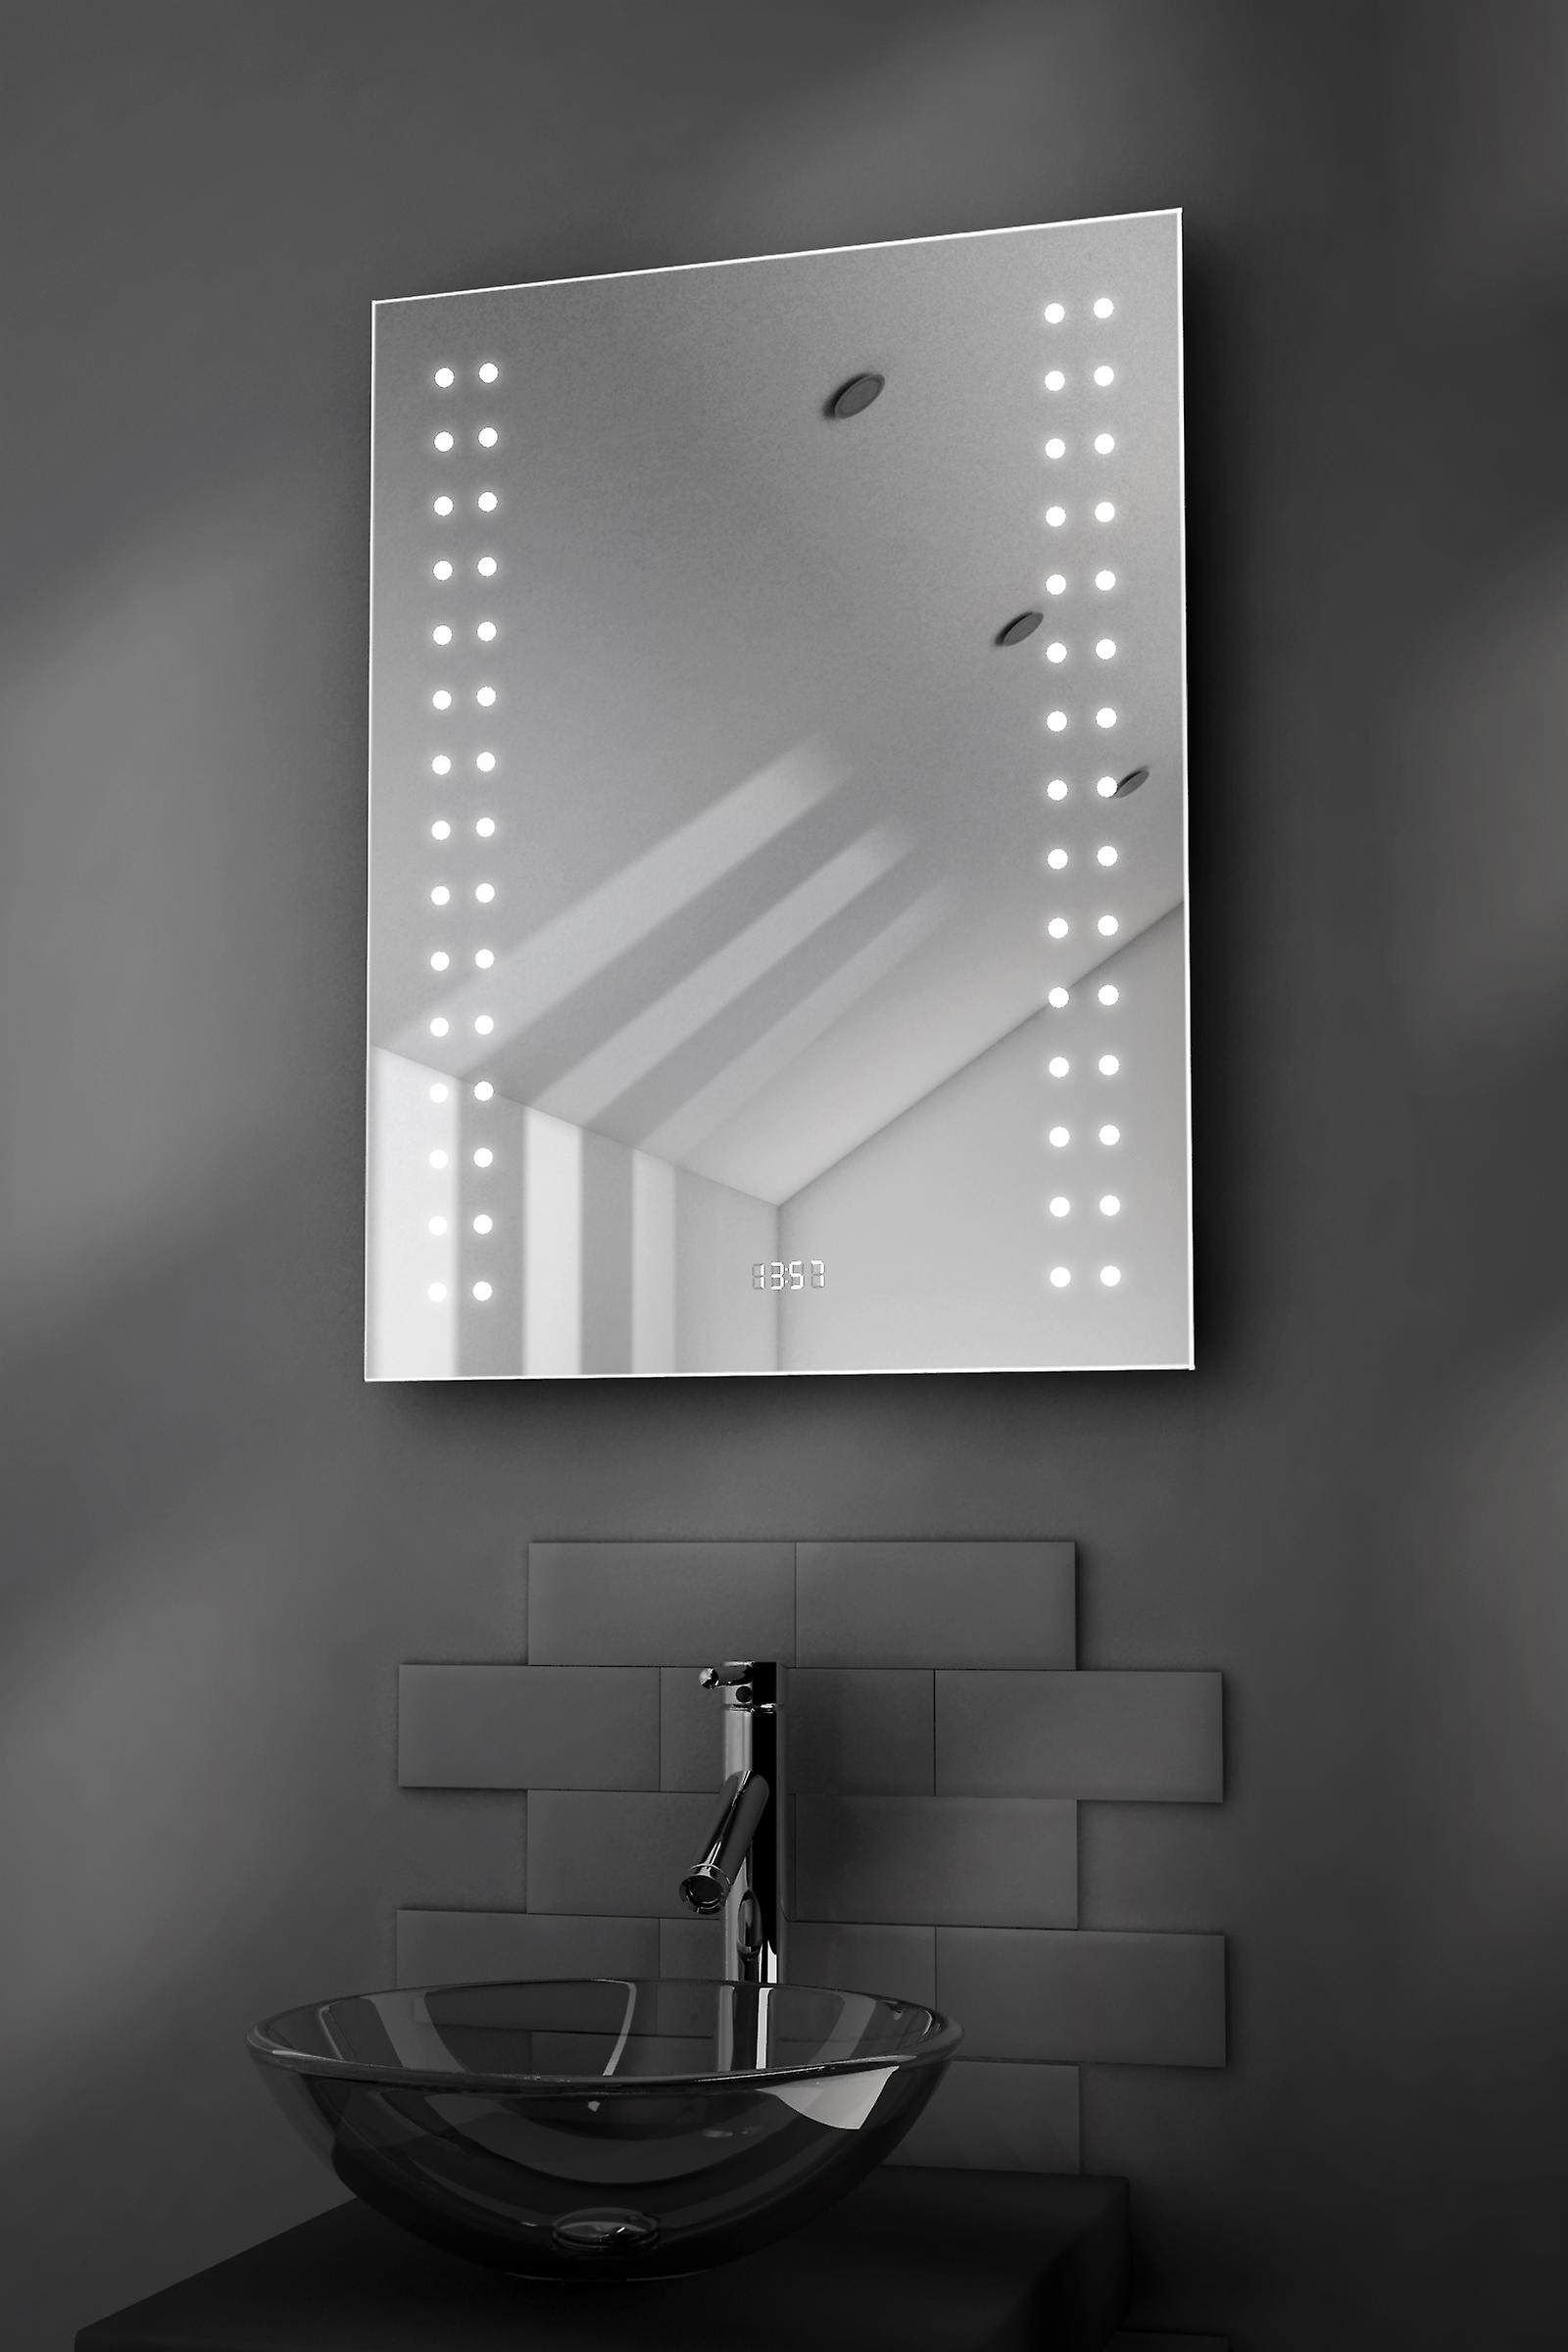 Doubleline Ultra-Slim Mirror With Clock, Demister & Sensor k186